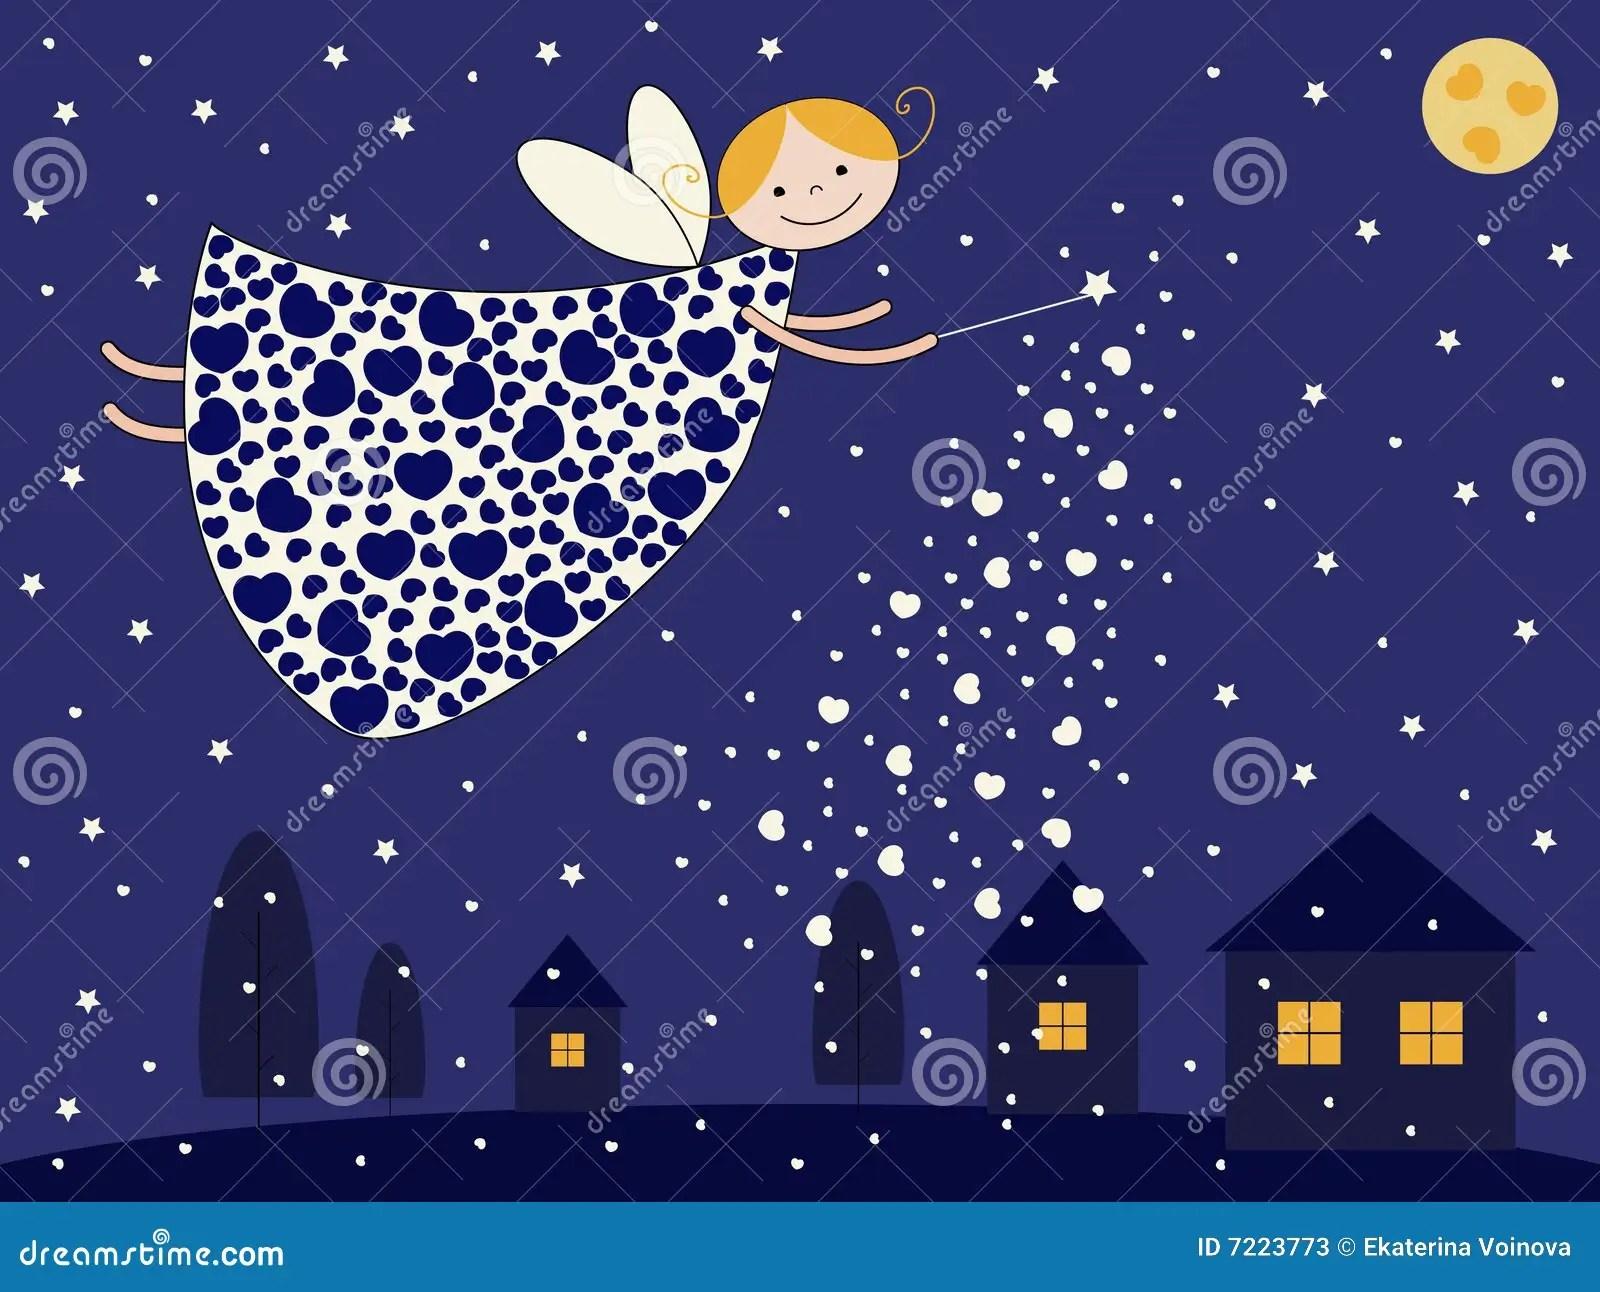 Night Fairy Stock Vector Illustration Of Cute House